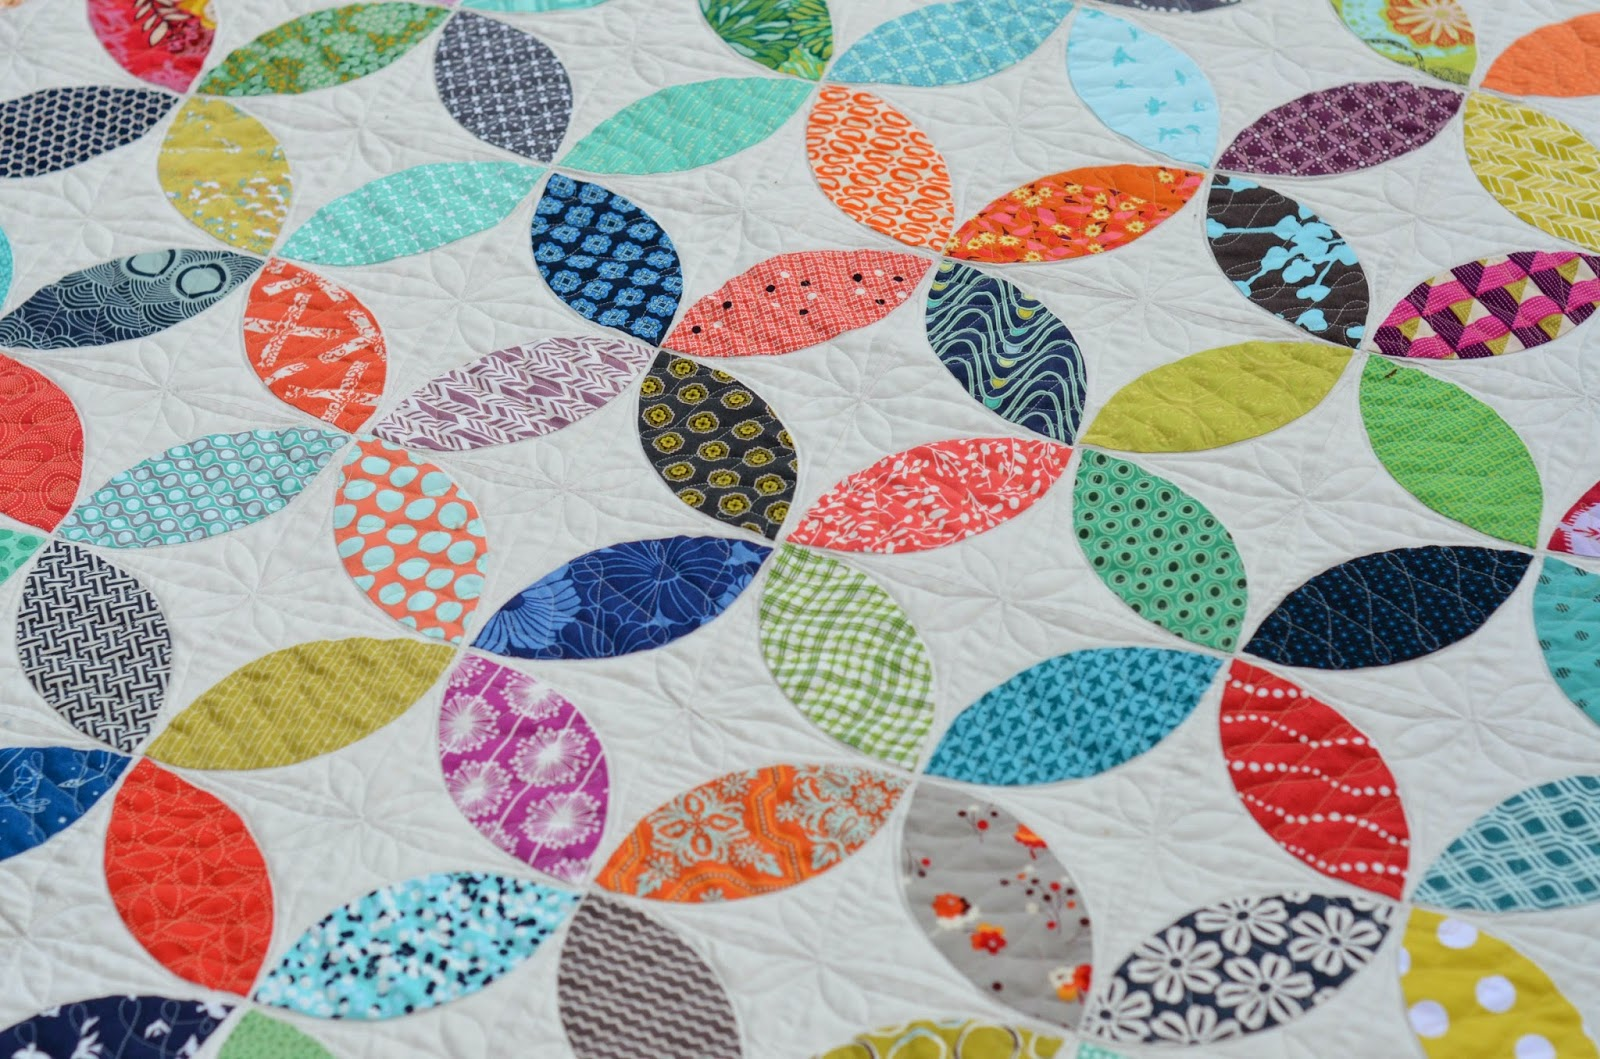 Hyacinth Quilt Designs Orange Peel Quilt